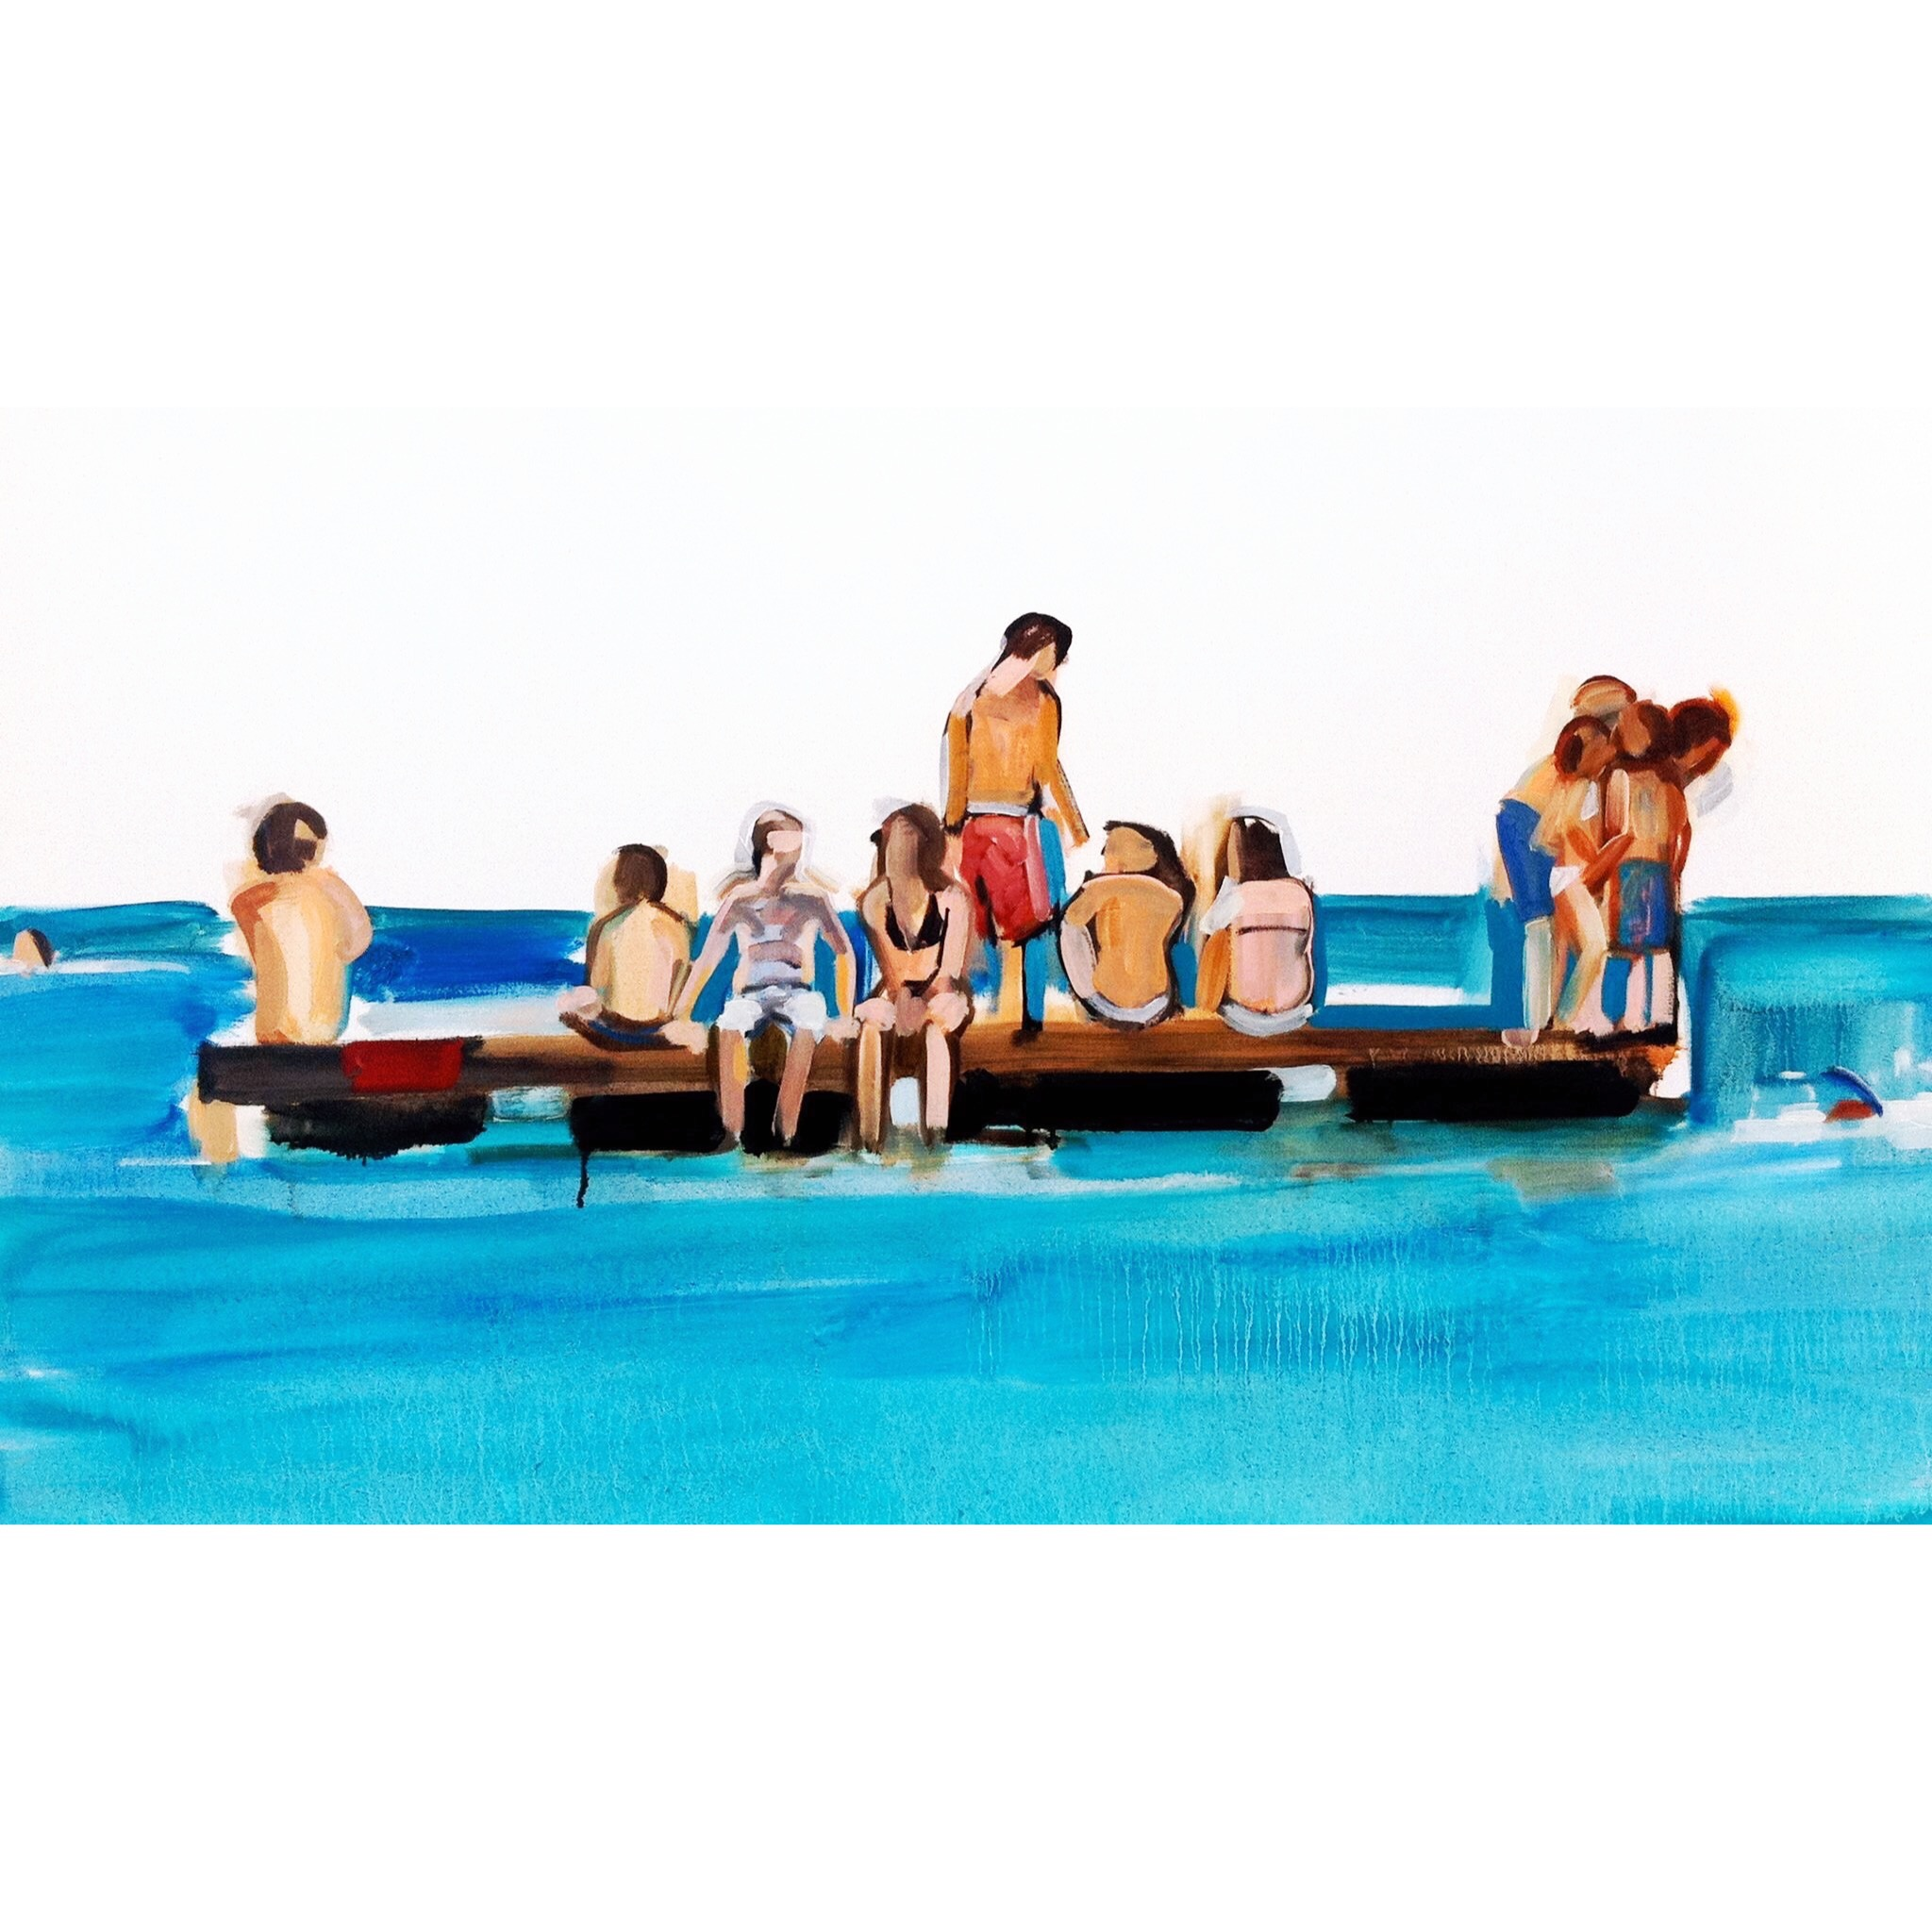 Mullins Beach 102 x 138 cm oil on canvas 2012